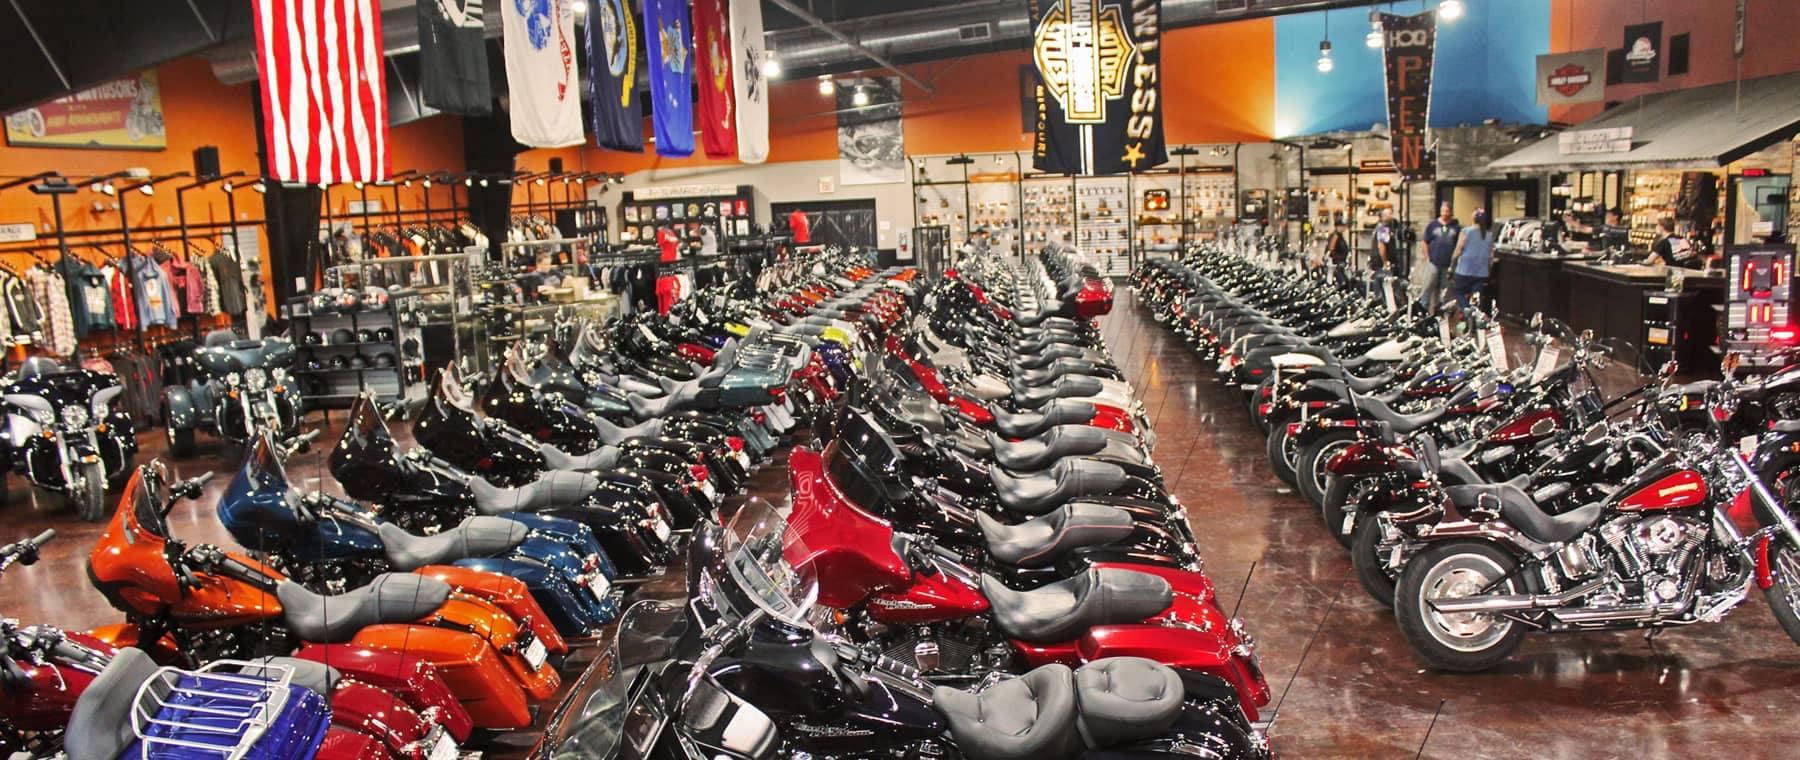 lawless dealership motor lineup